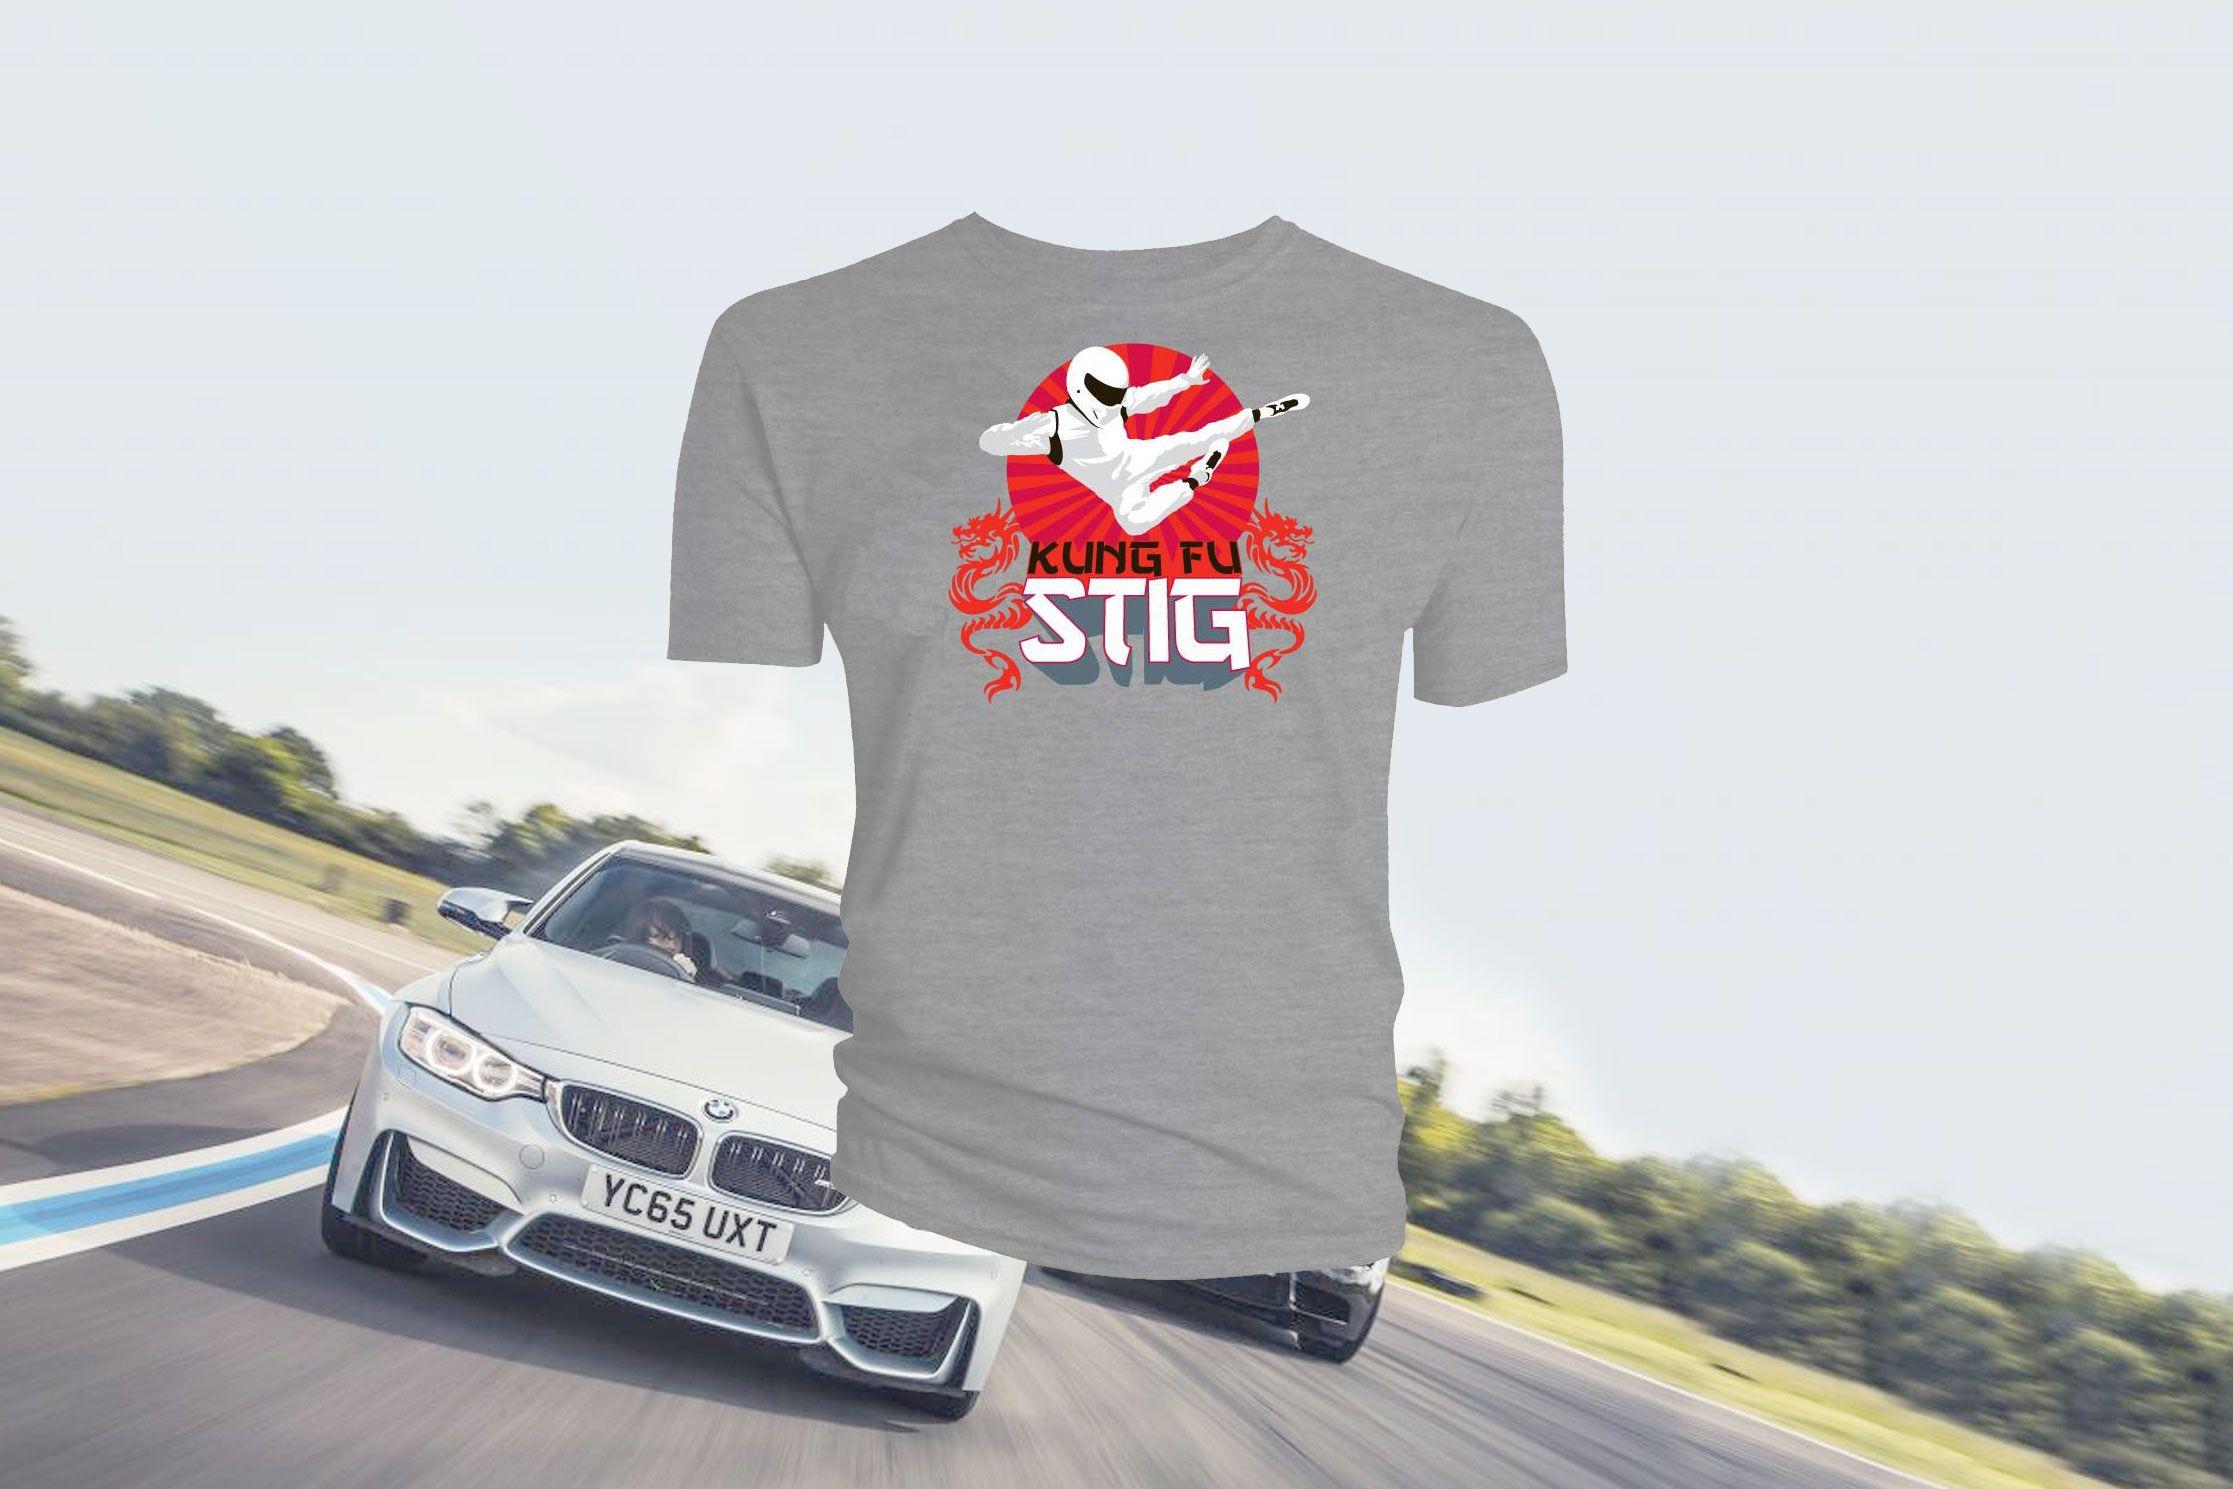 TopGear-abonnement met gratis Stig Kung-Fu-shirt - https://www.topgear.nl/autonieuws/gratis-stig-kung-fu-shirt/